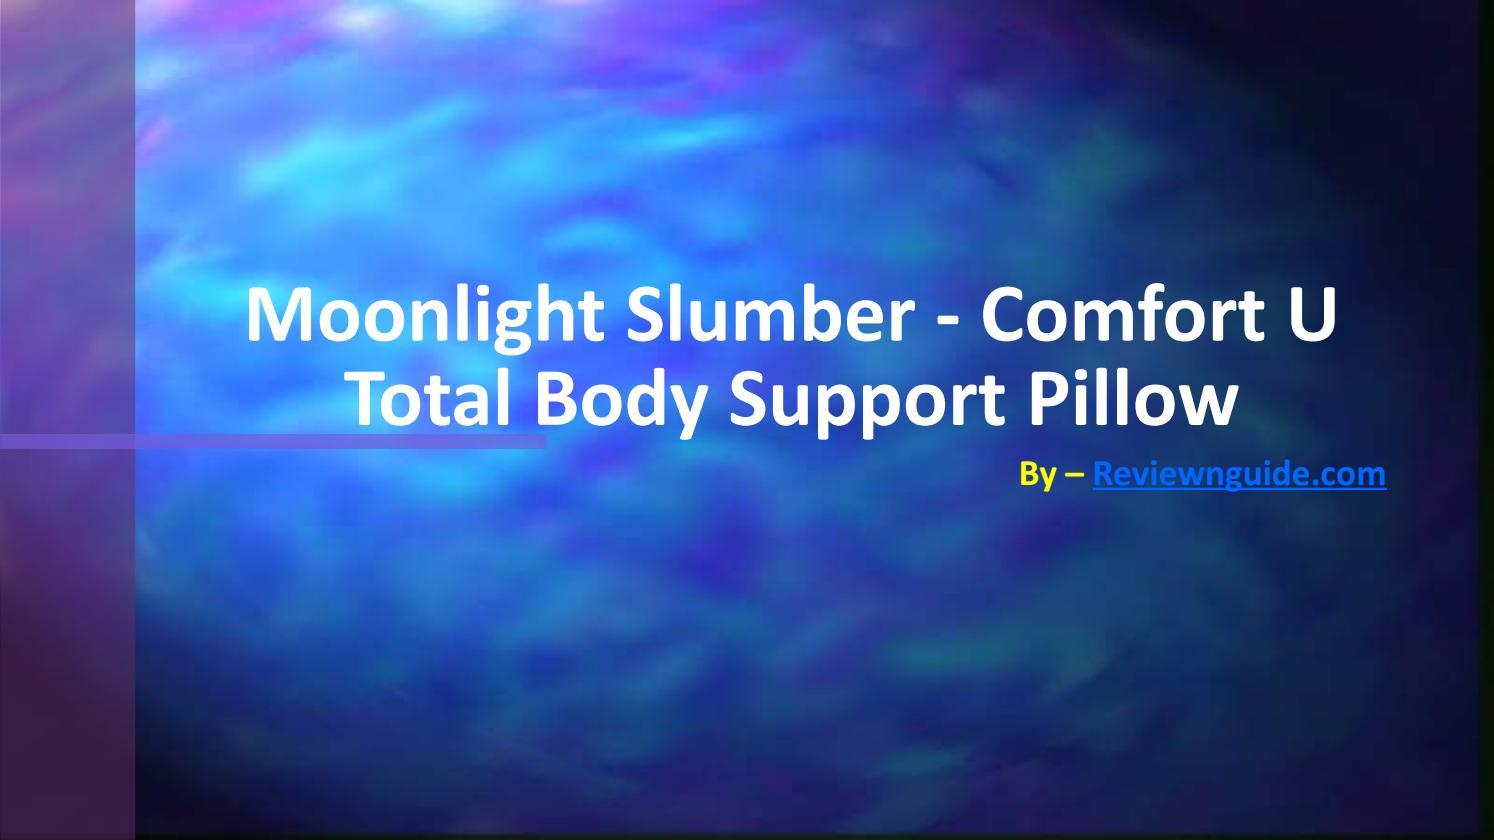 Petite Moonlight Slumber Petite Comfort U Total Body Support Pillow